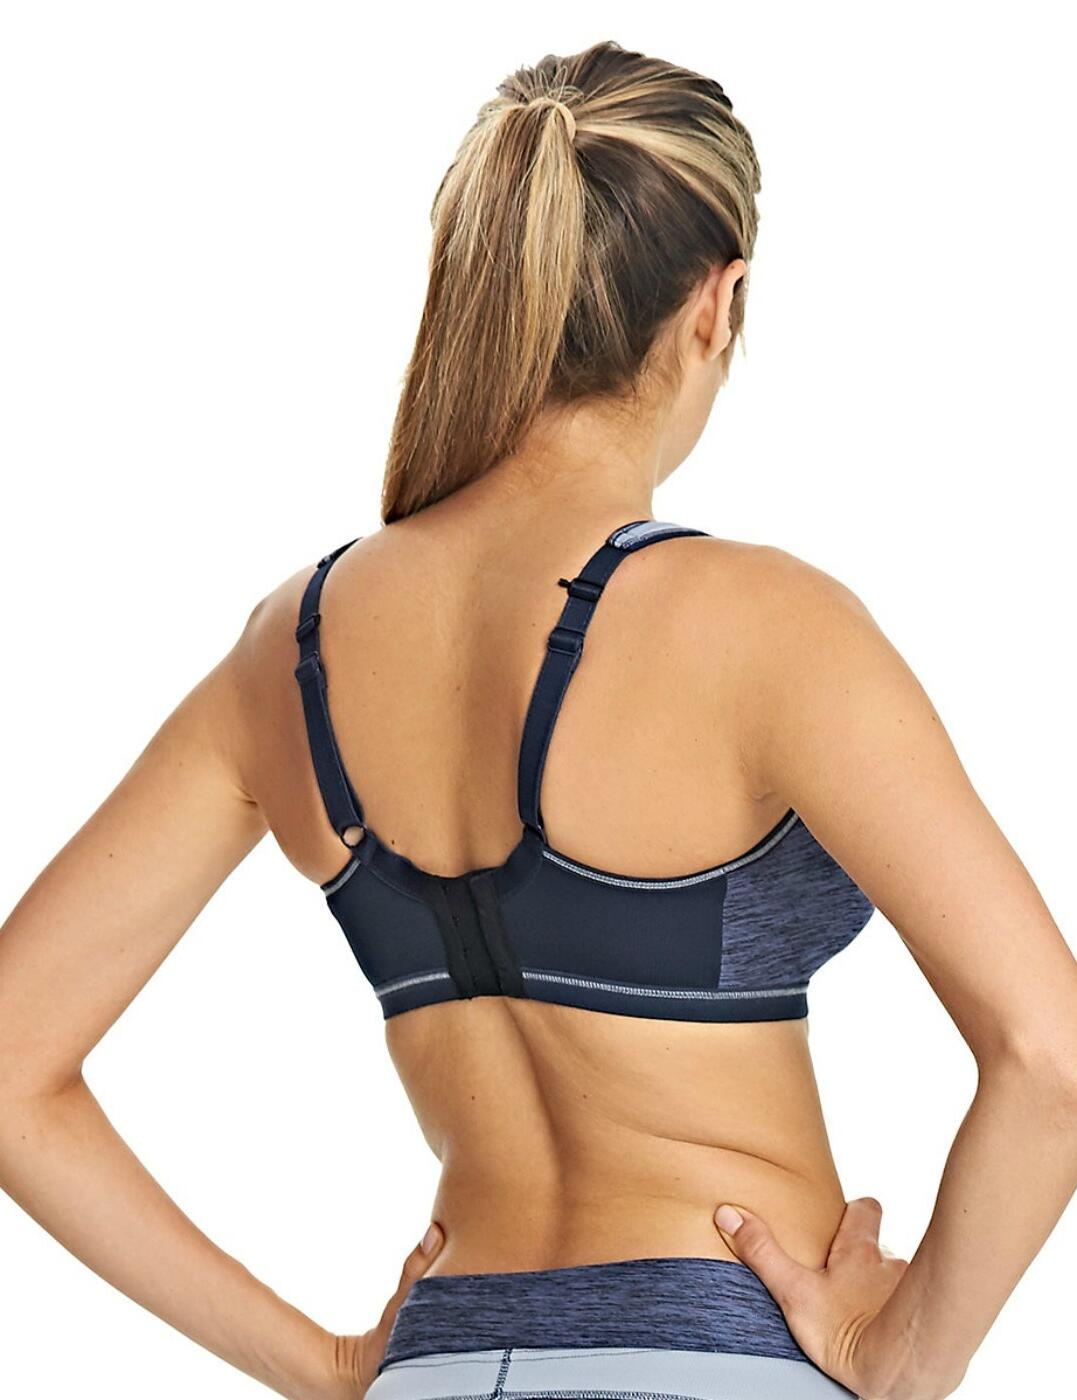 Freya-Active-Force-Sports-Bra-4000-High-Impact-Non-Wired-Womens-Gym-Bras miniatura 18